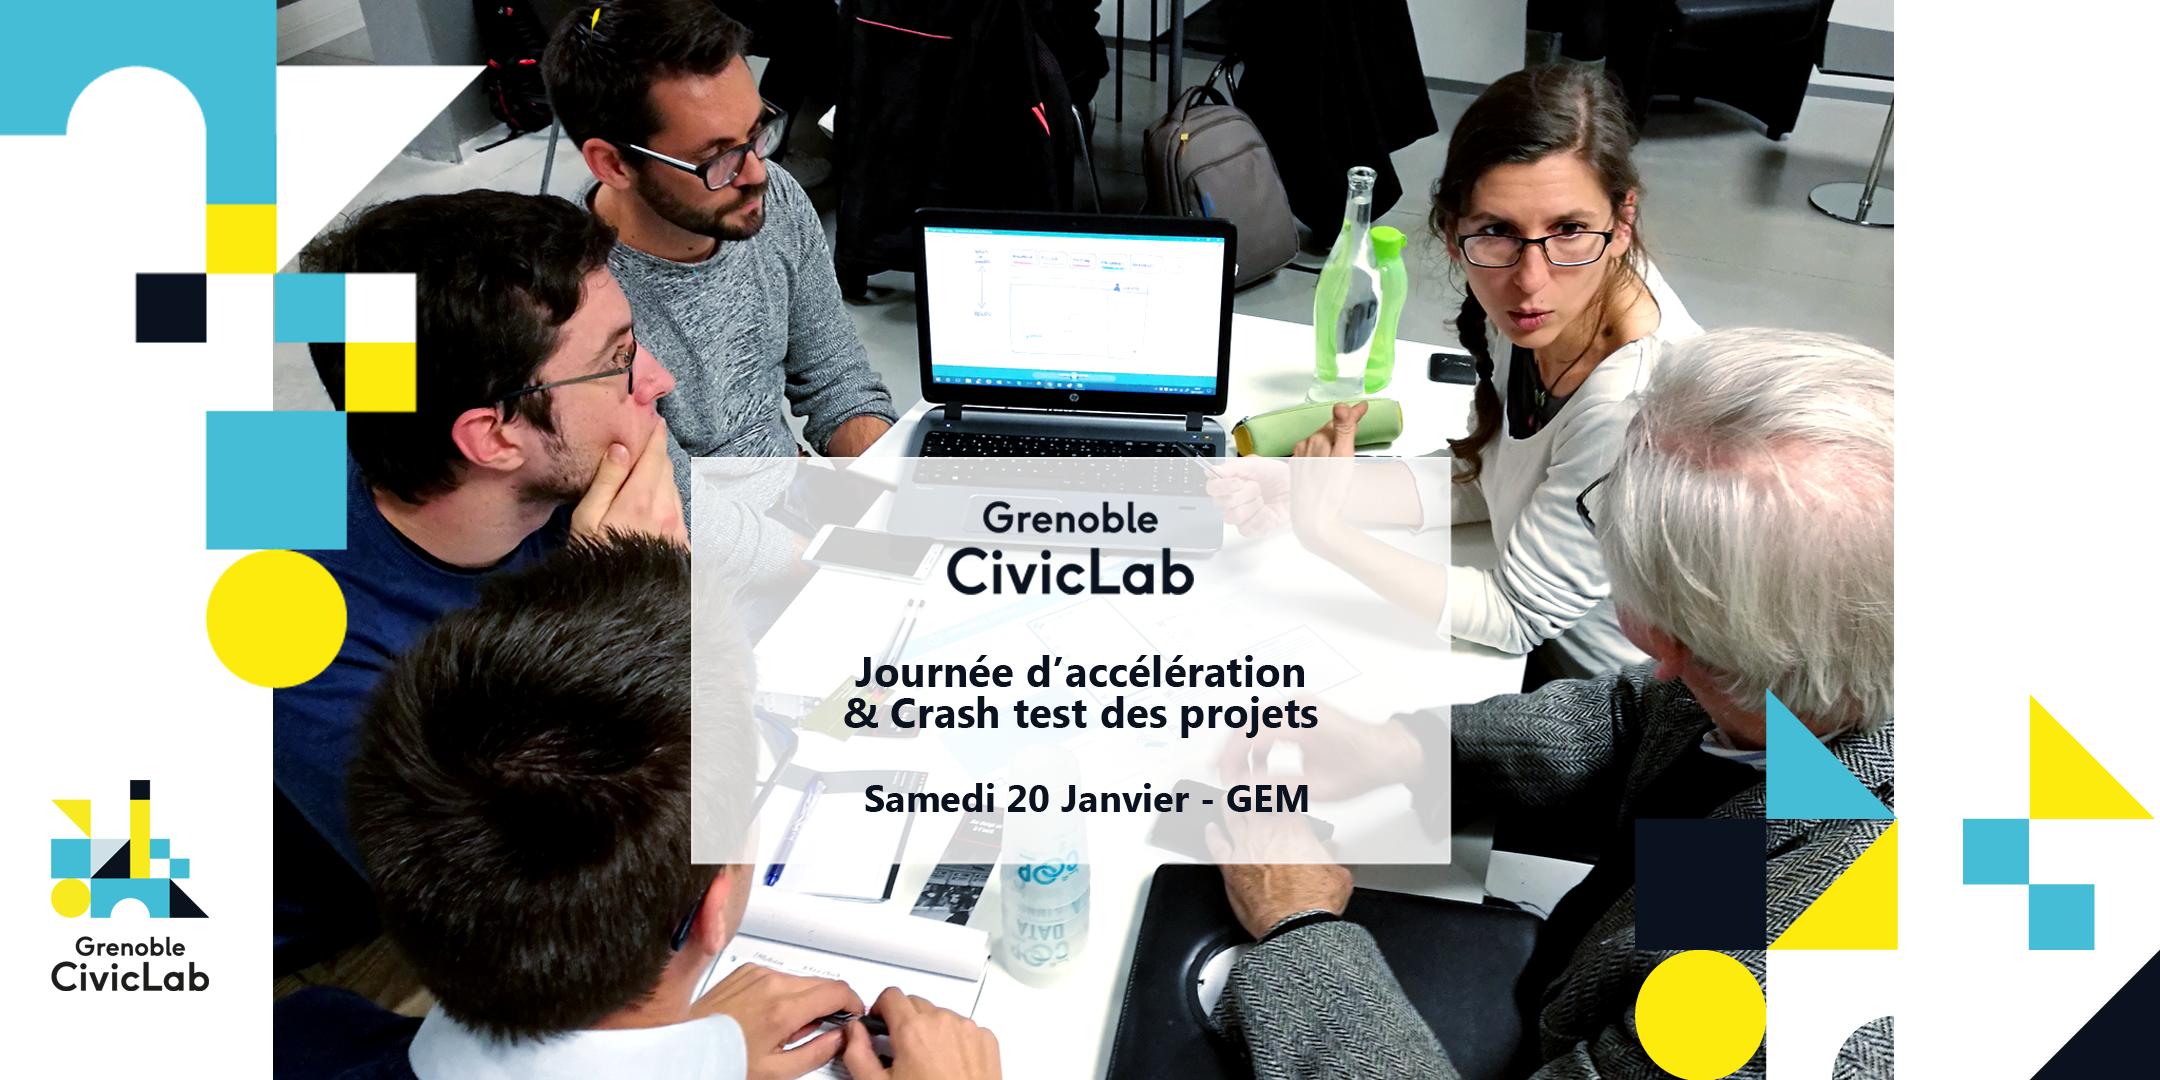 http://2018grenoble.civiclab.eu/wp-content/uploads/2017/12/20-janv-Eventbrite.png